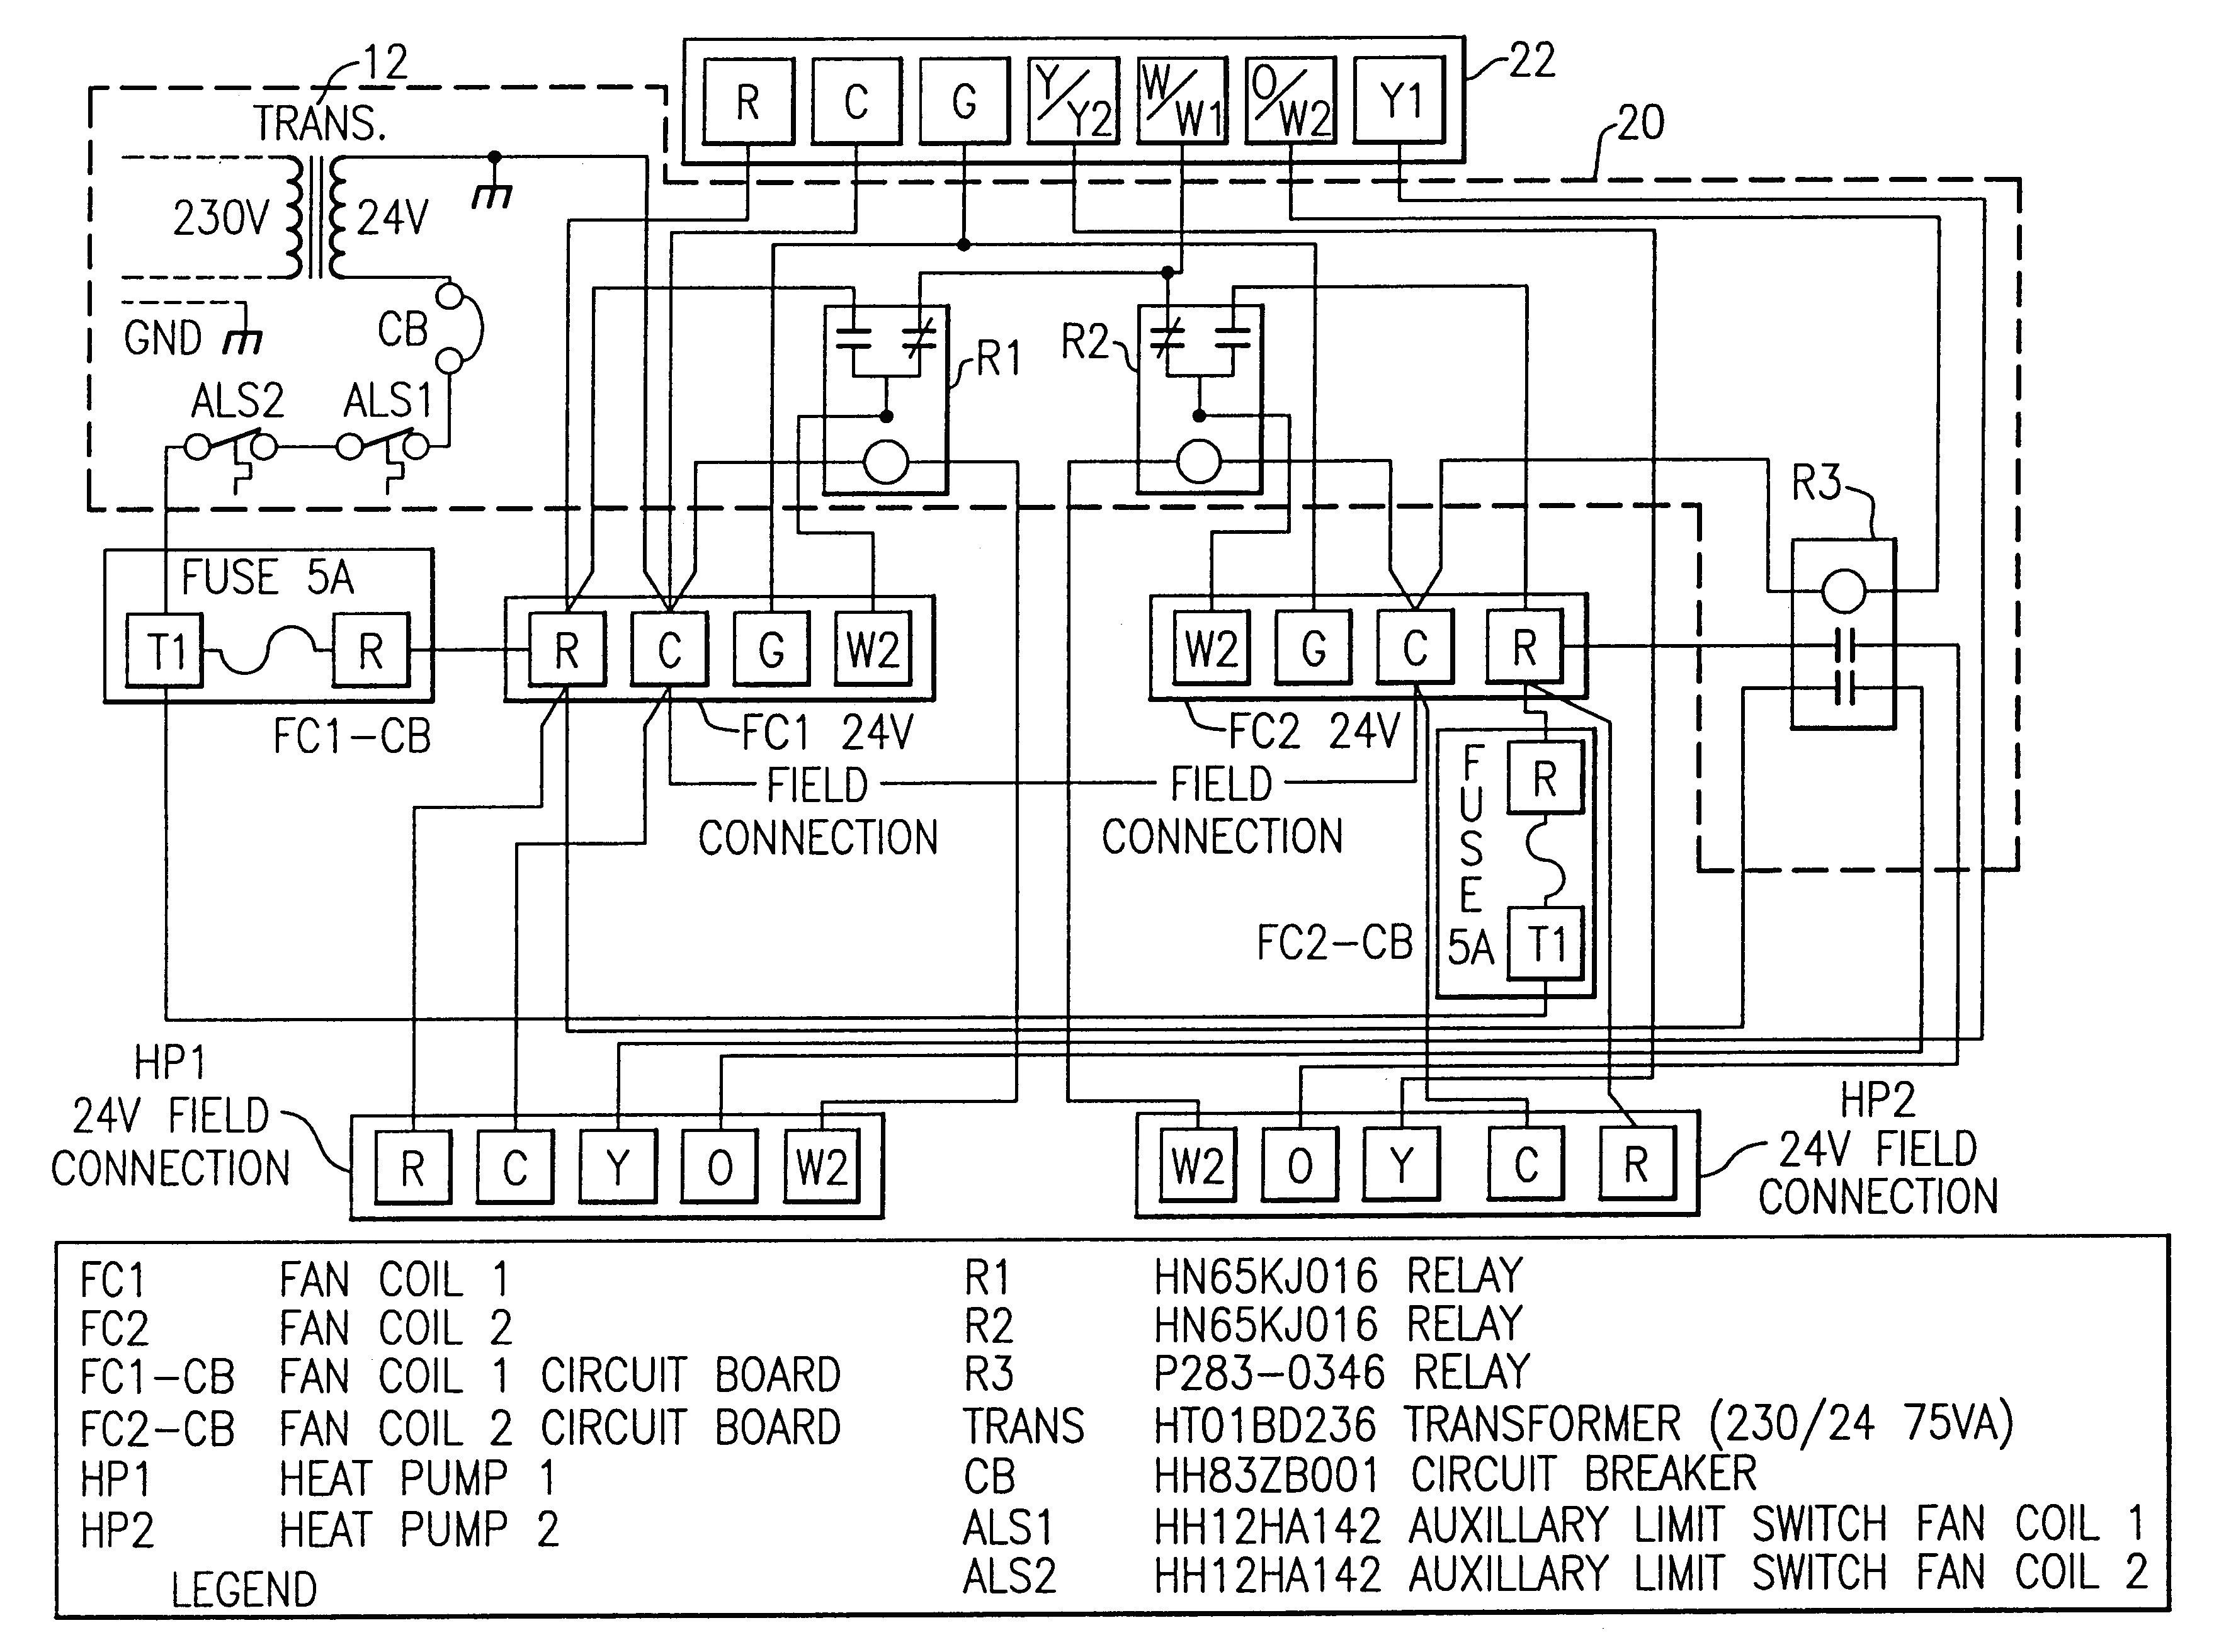 basic hvac ladder diagrams on gas fired furnace ladder diagram